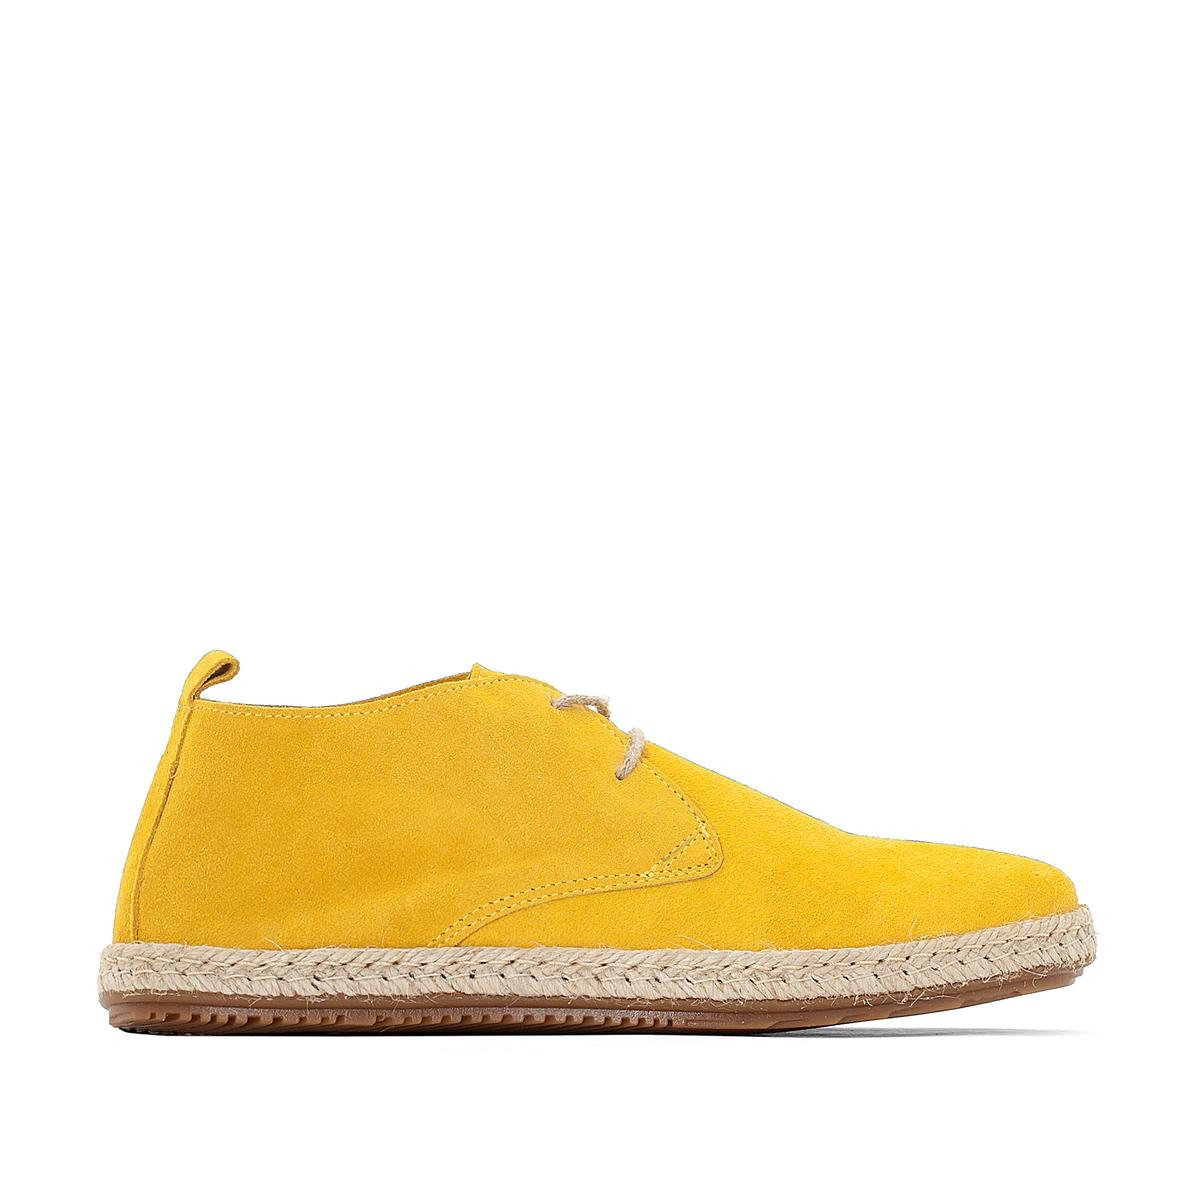 Ботинки-дерби в стиле эспадрилий